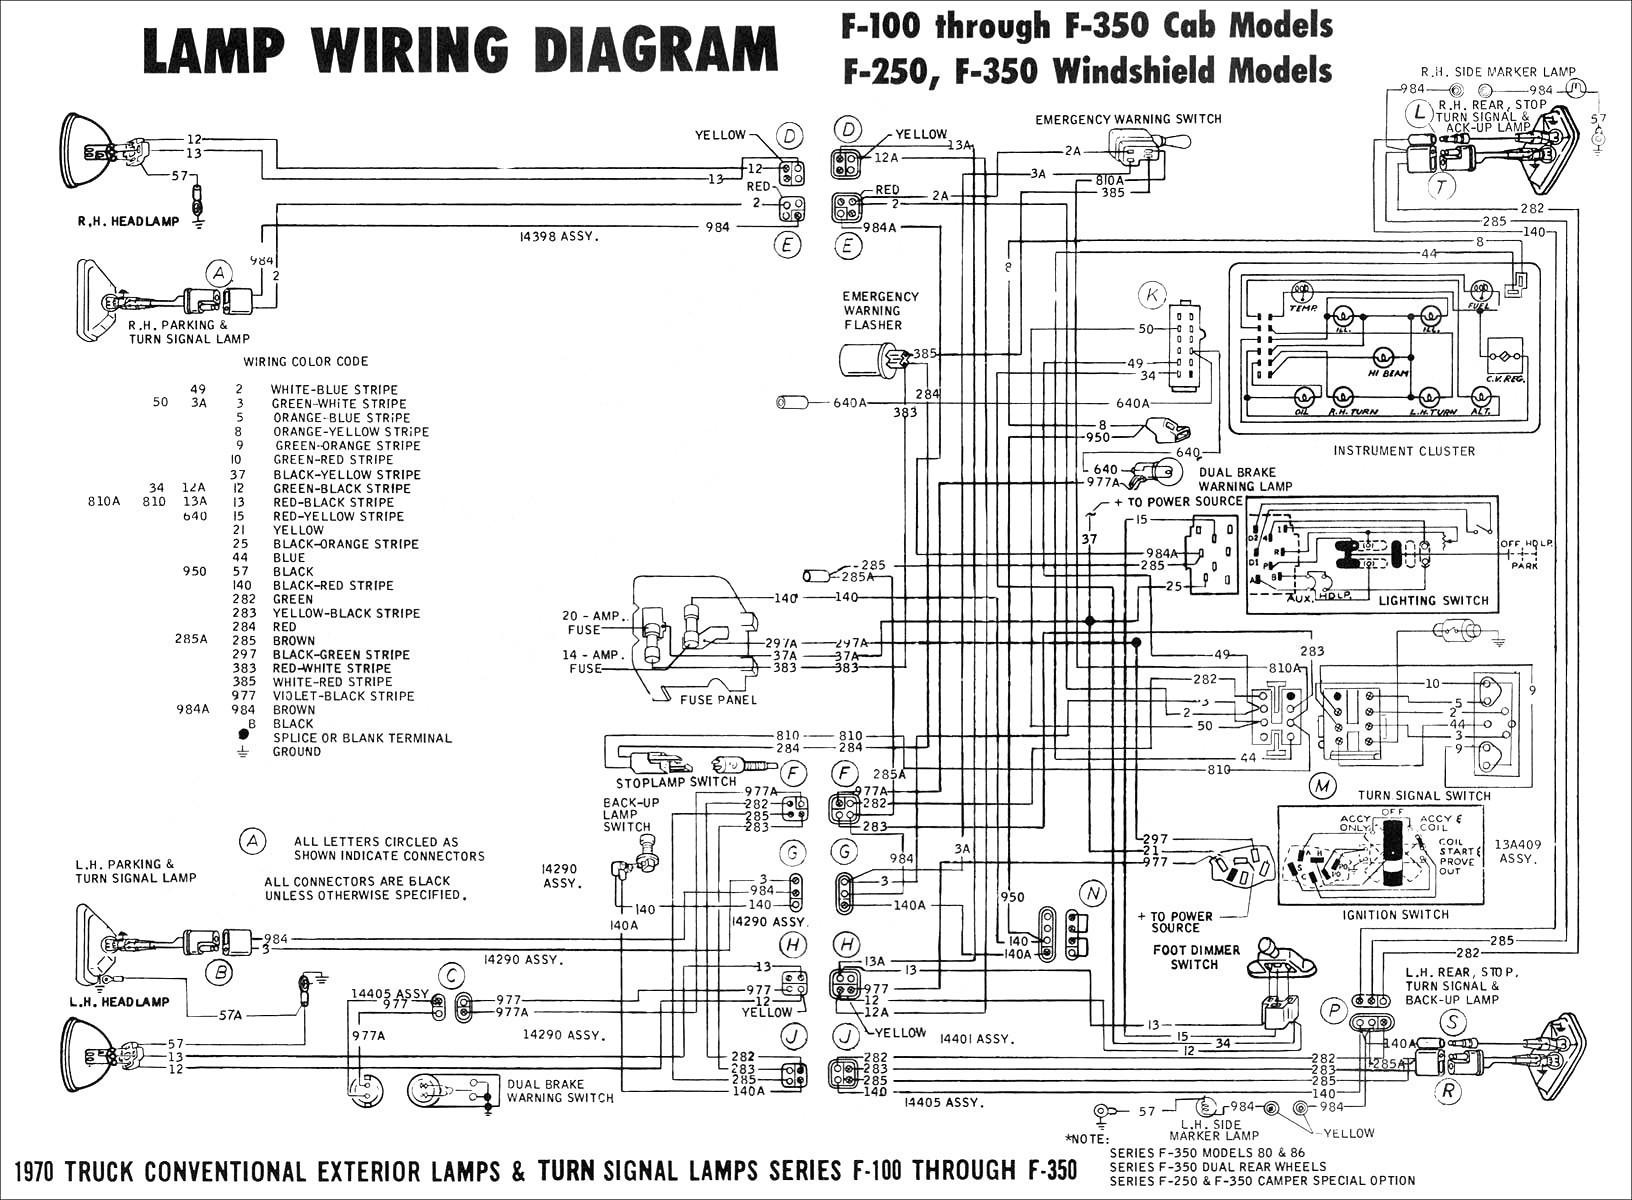 hight resolution of 1998 nissan altima engine diagram 2000 audi a4 radio wiring diagram valid 1999 nissan altima radio